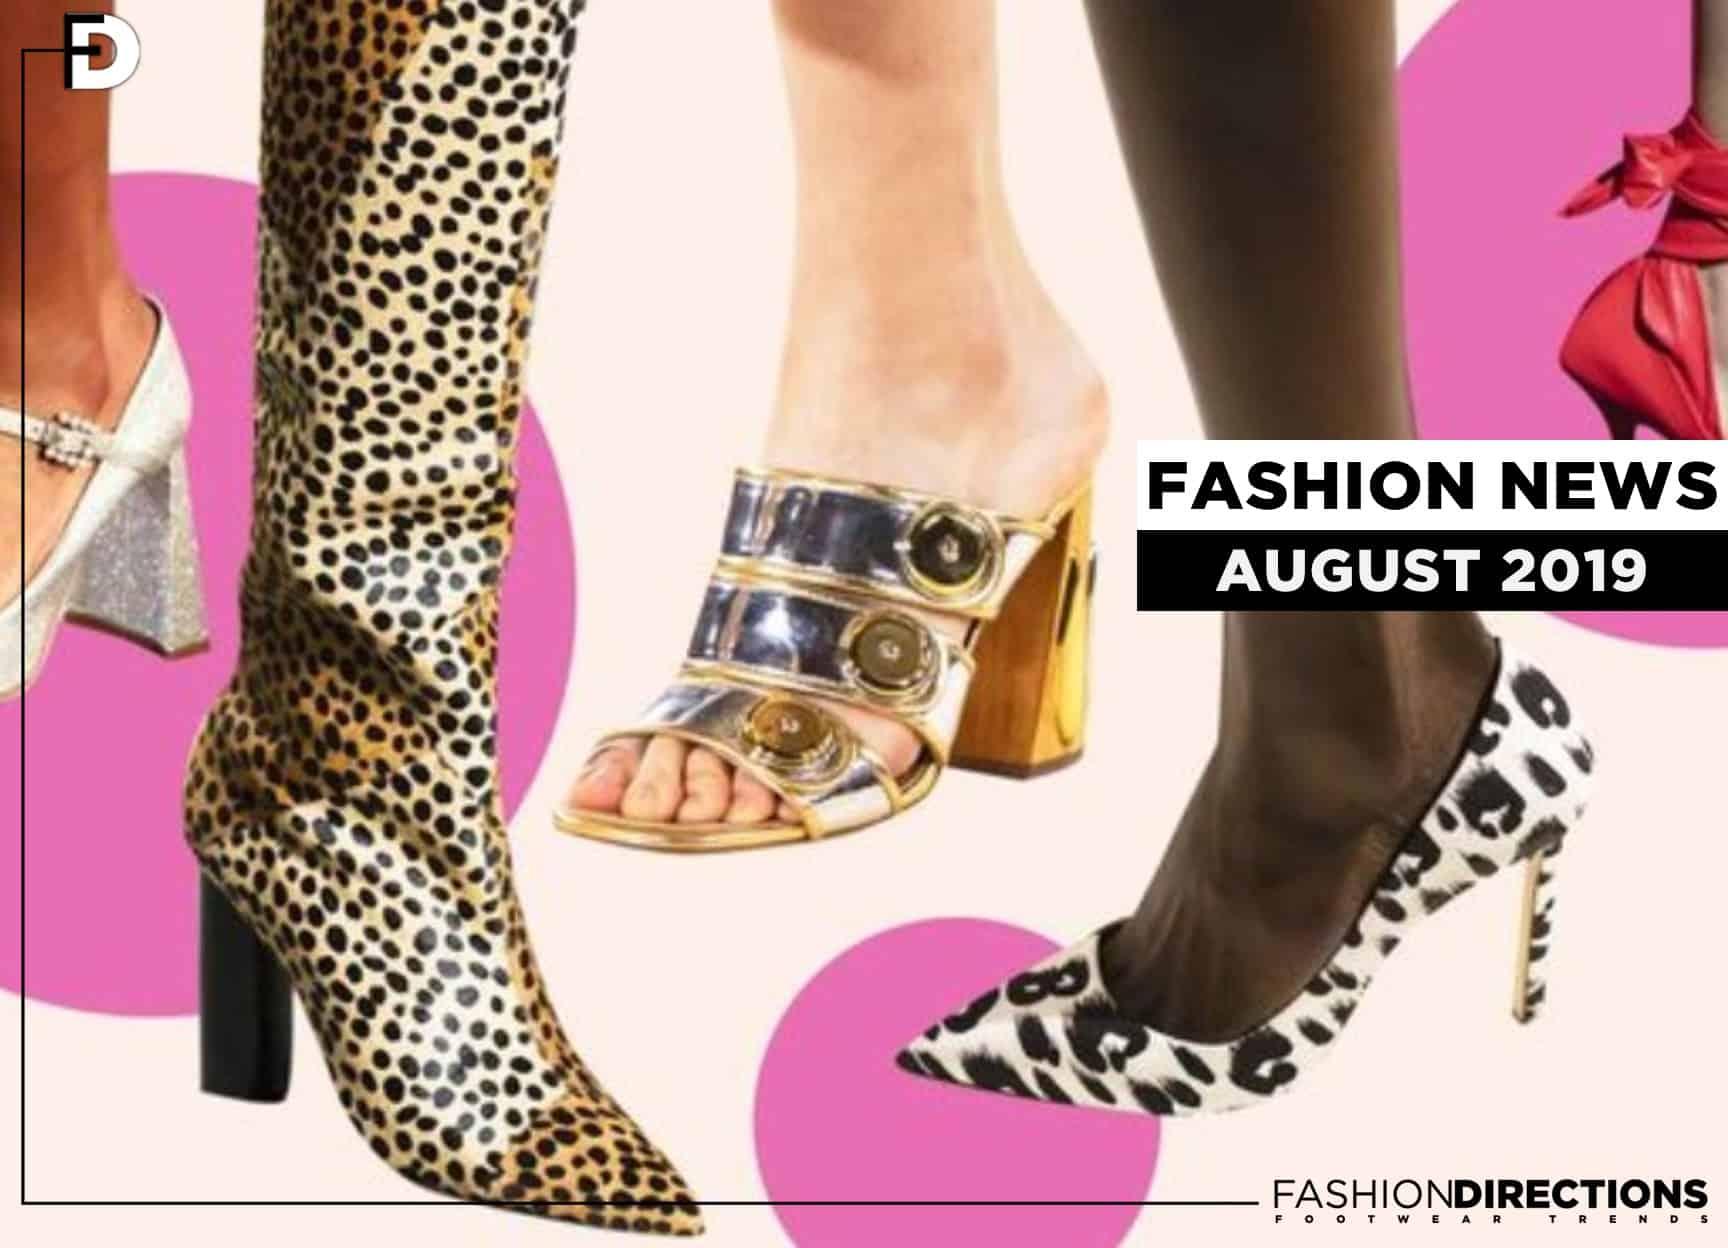 FW19 1 Footwear News August 2019